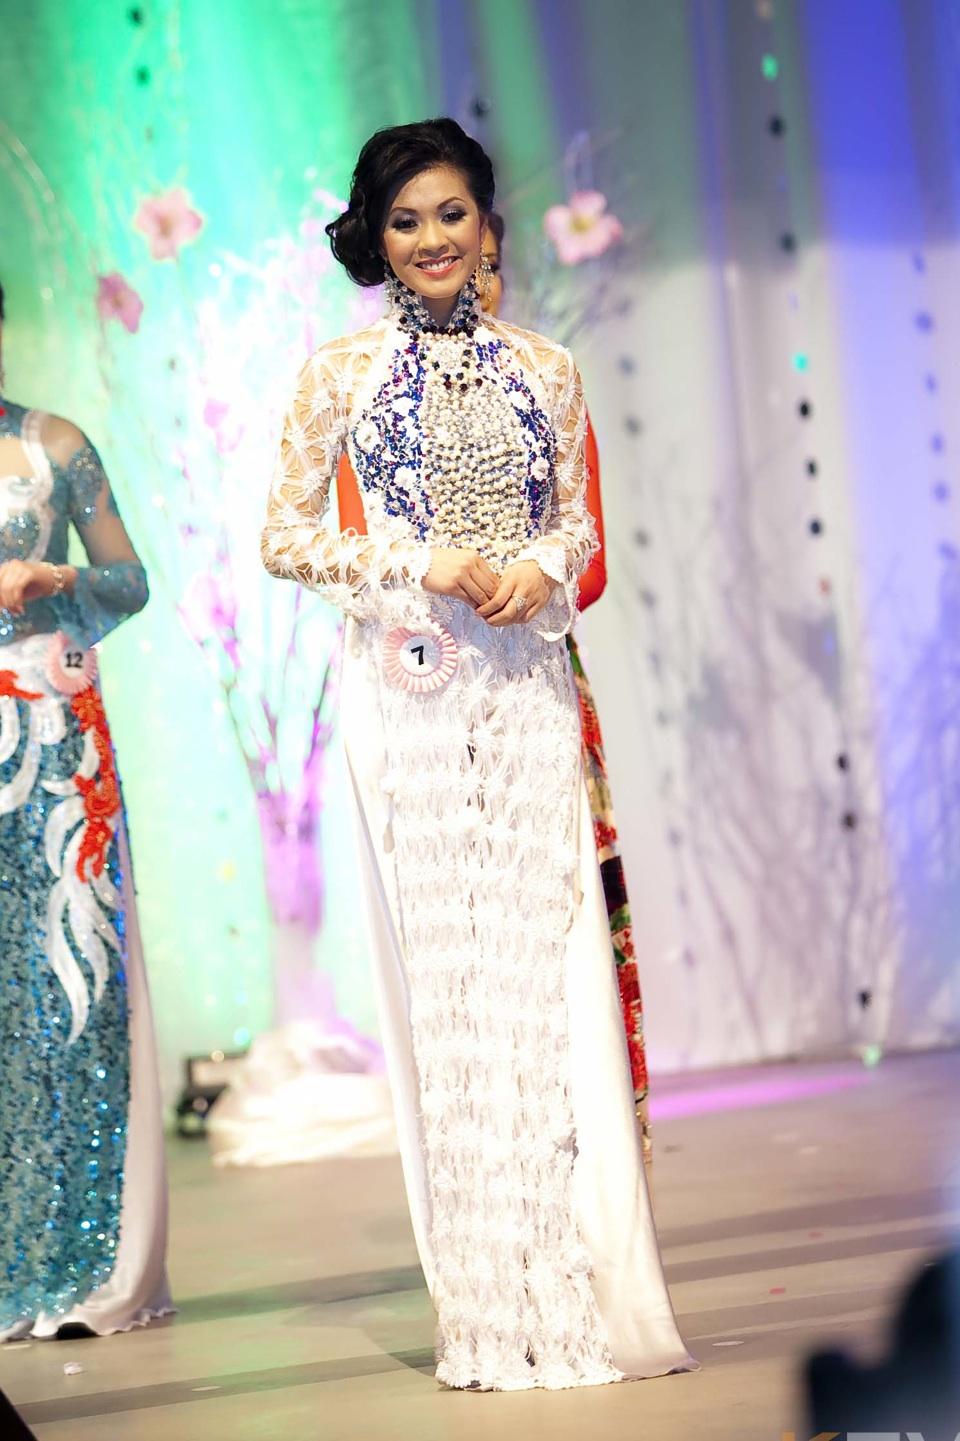 Miss Vietnam - Hoa Hau Ao Dai Bac Cali 2010 - Pageant Day - Image 106